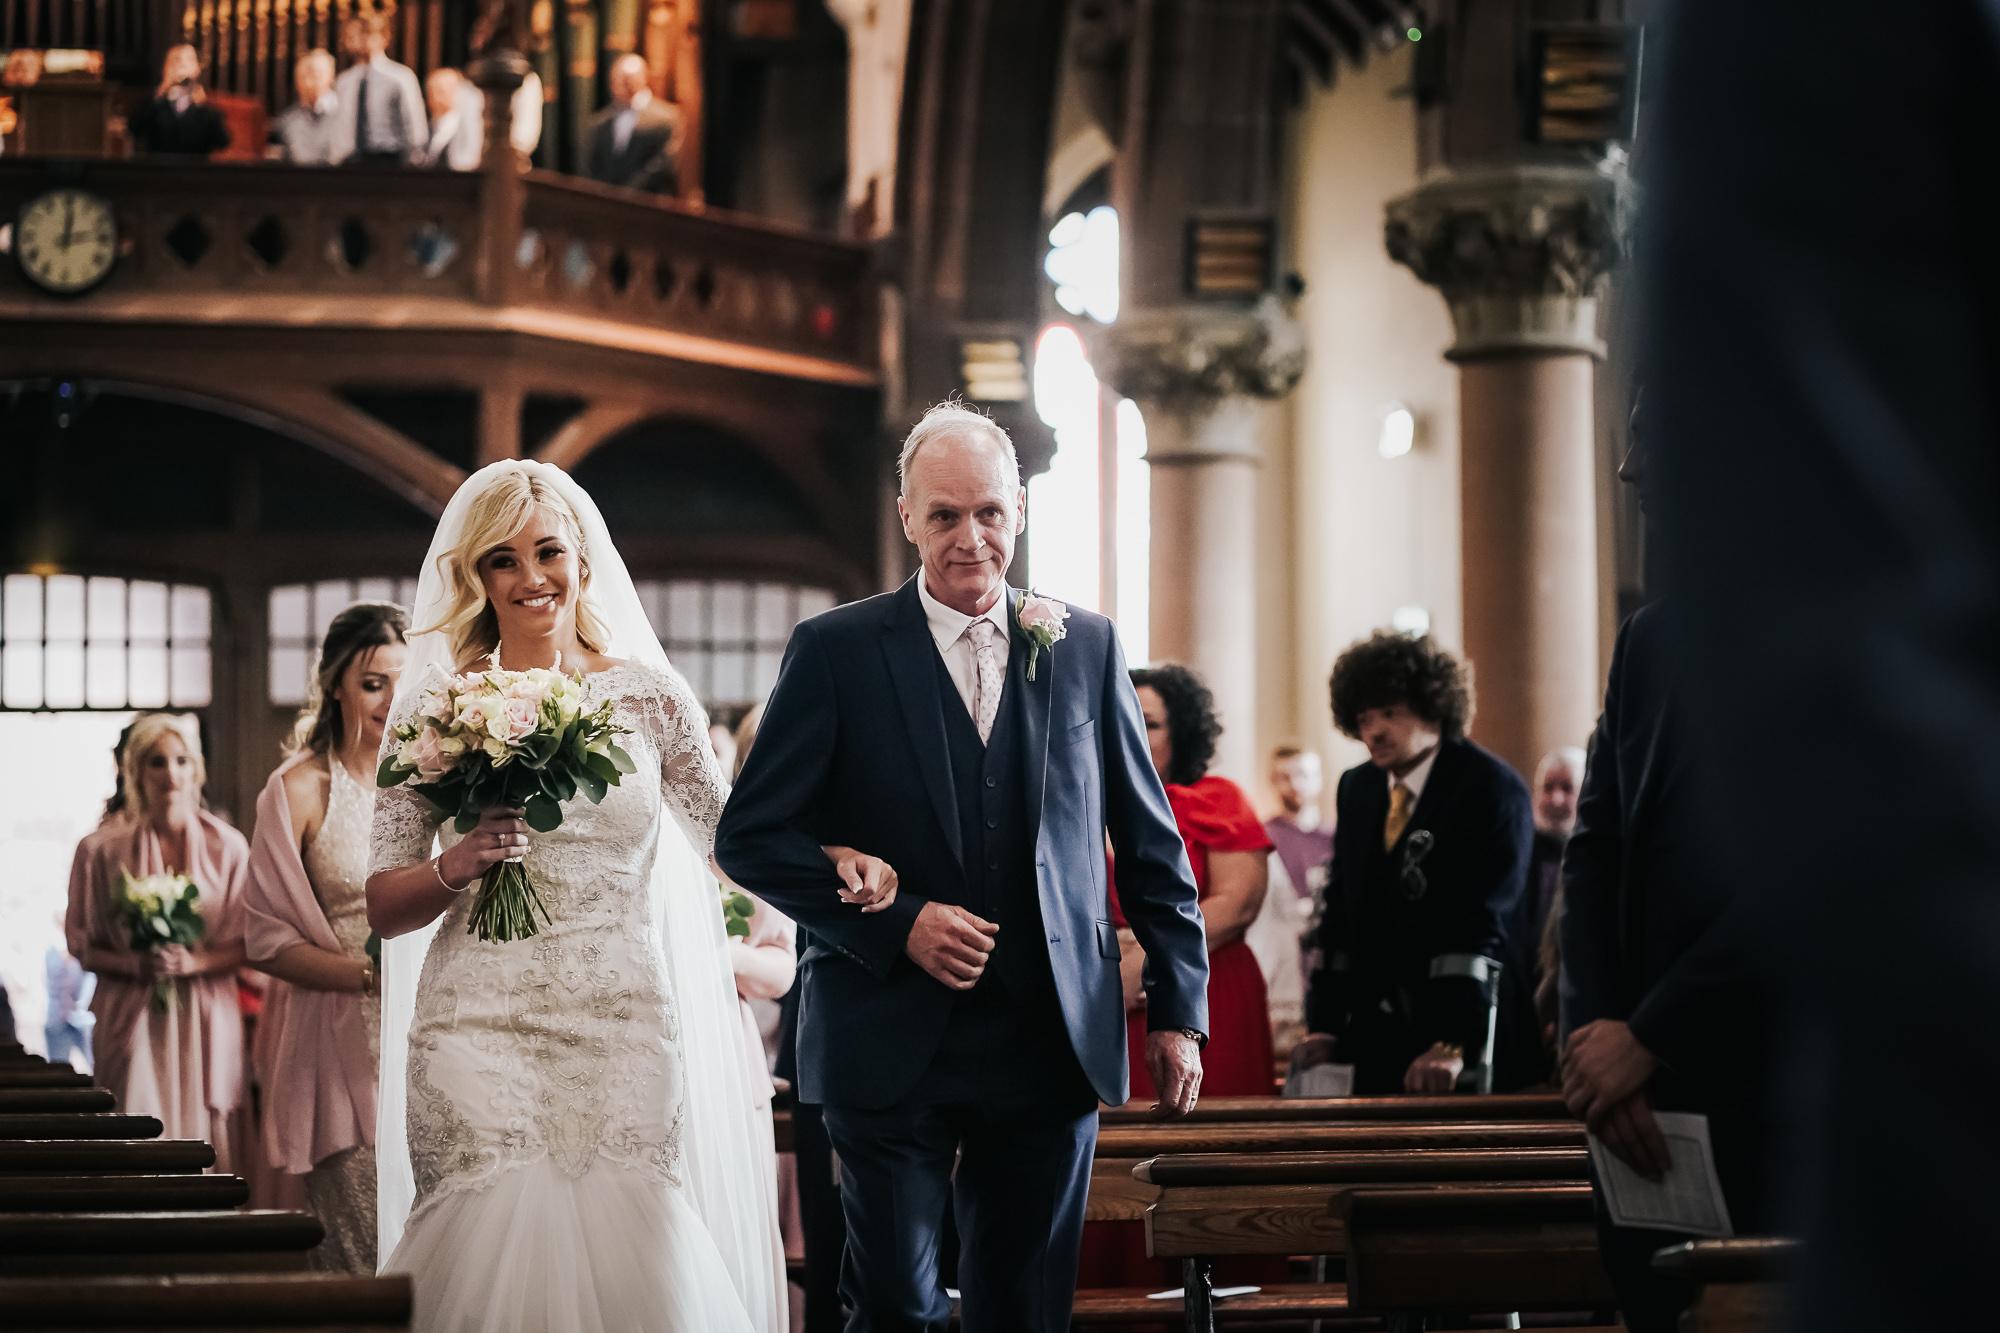 Thornton Manor Lakeside Marquee Wedding Photographer  (16 of 53).jpg